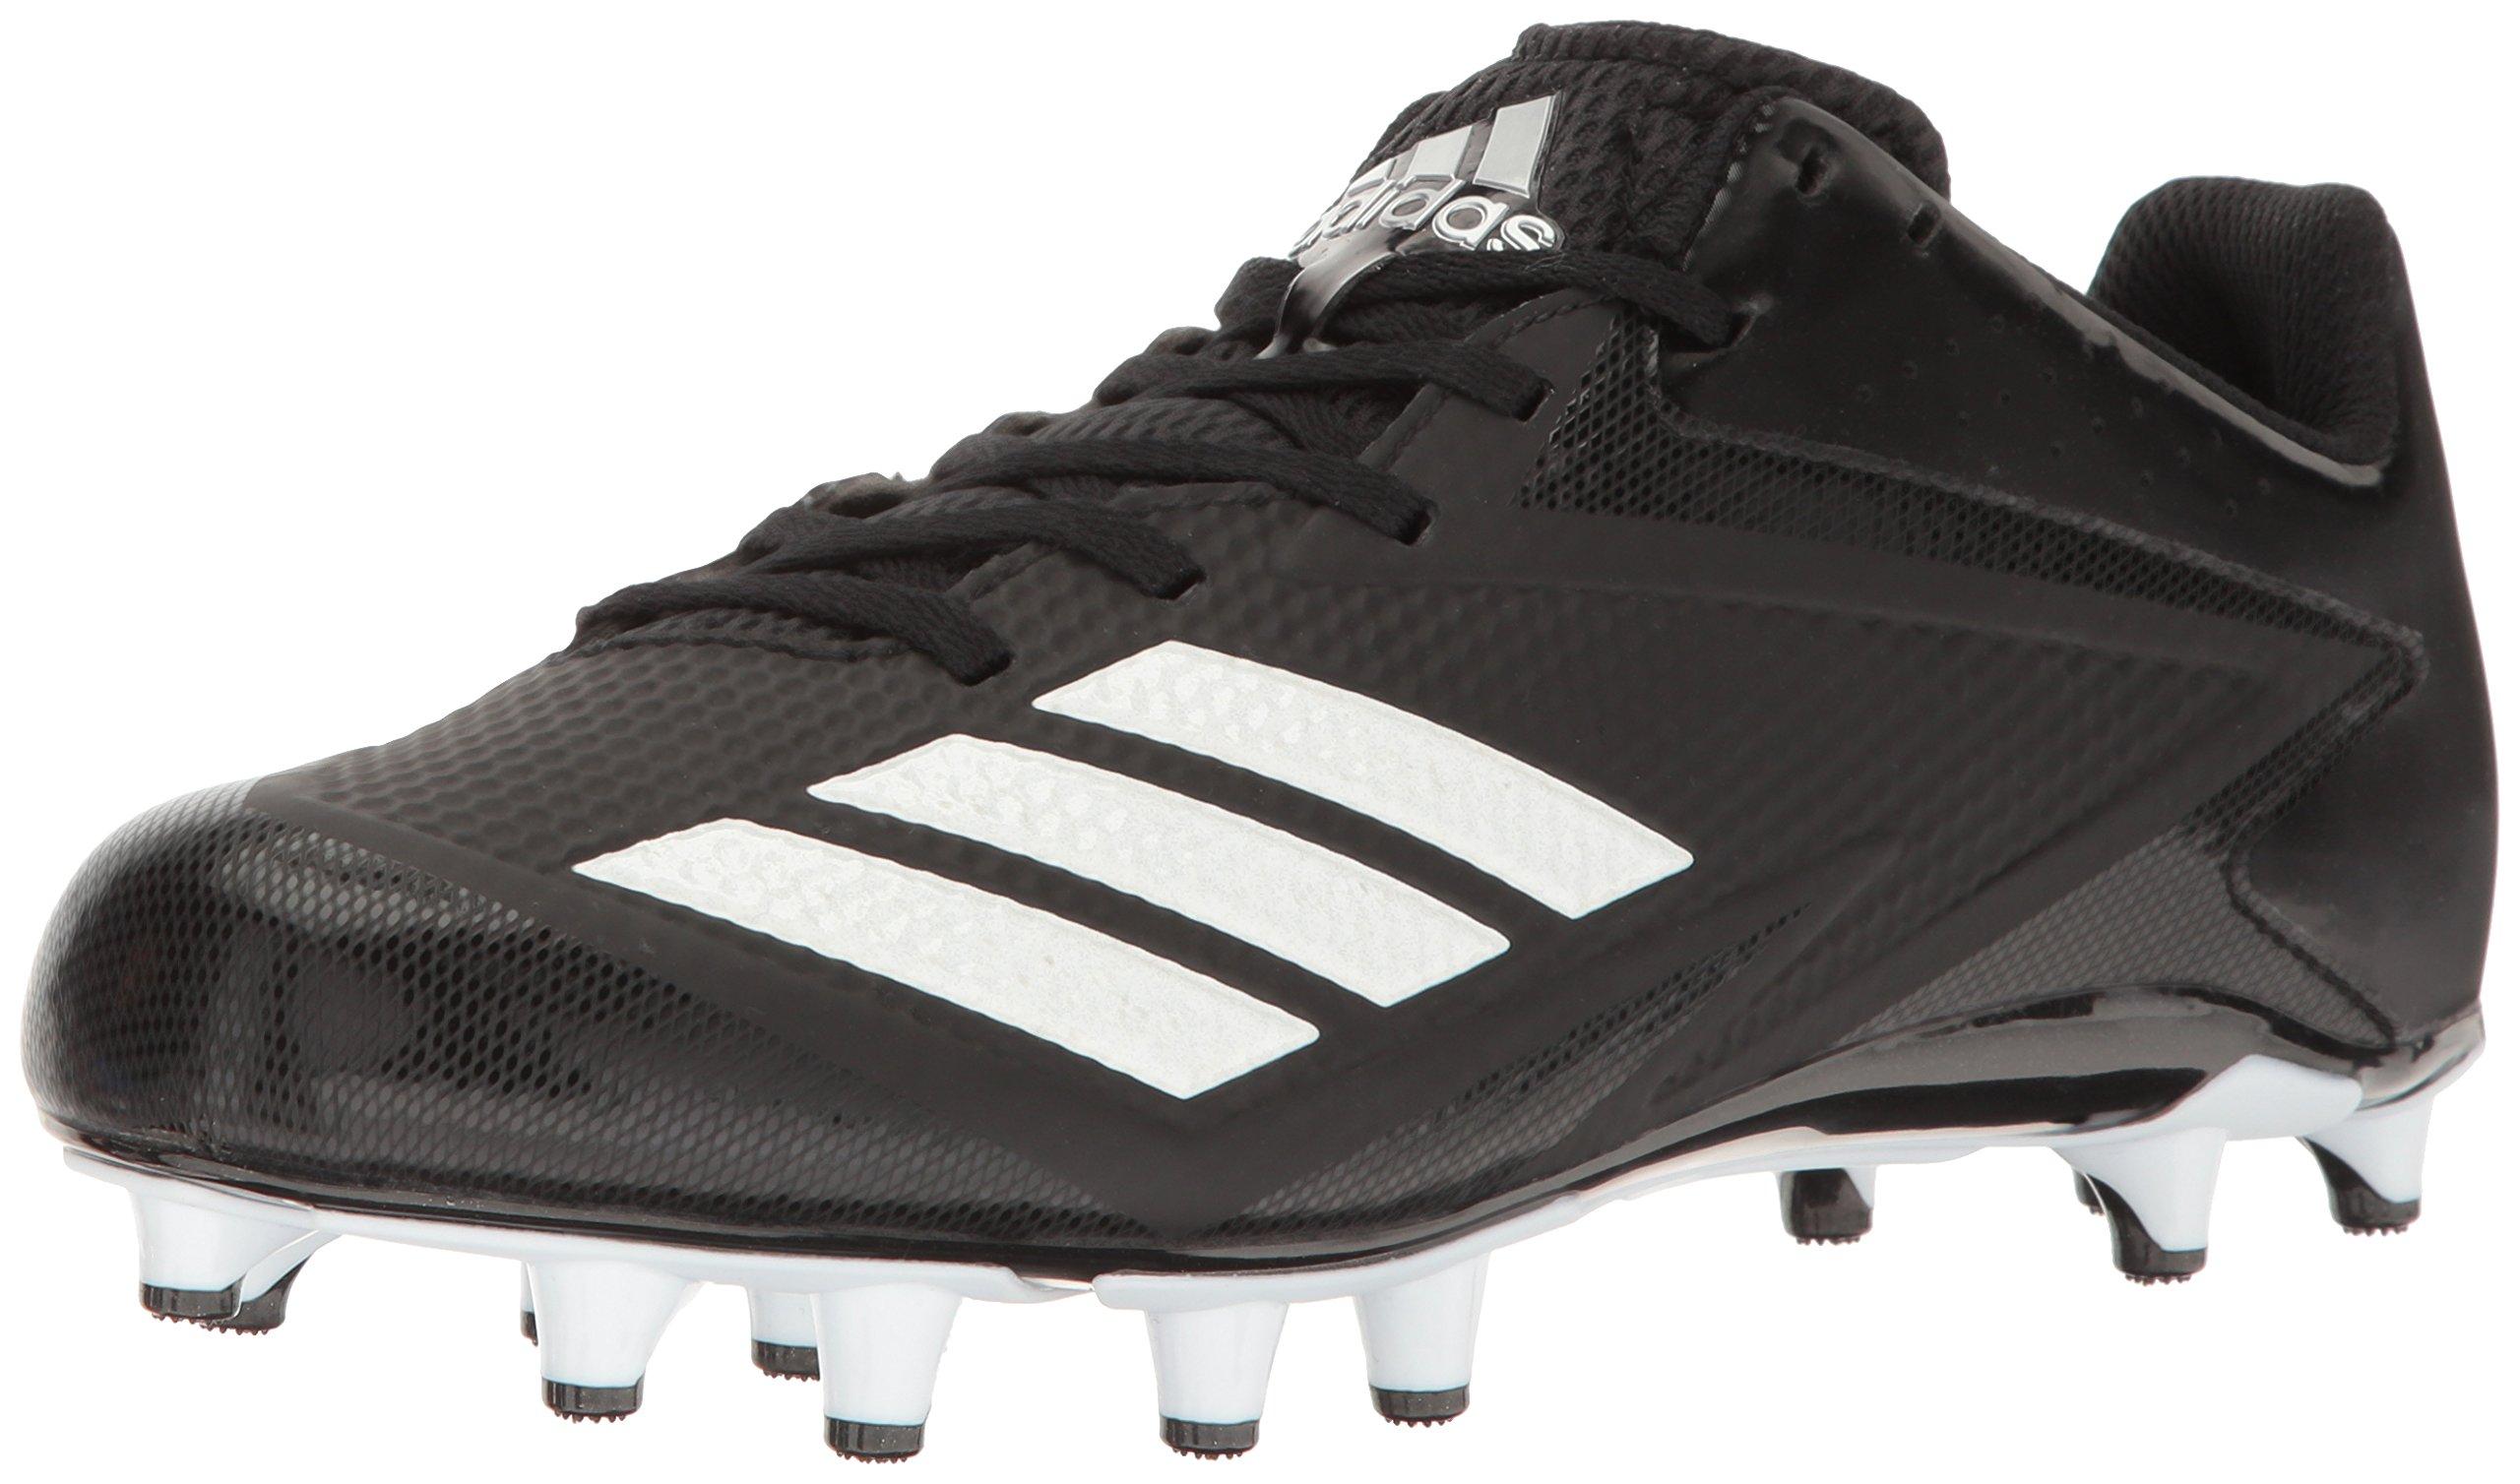 adidas Men's Freak X Carbon Mid Football Shoe, Black/White/Metallic Silver, 15 Medium US